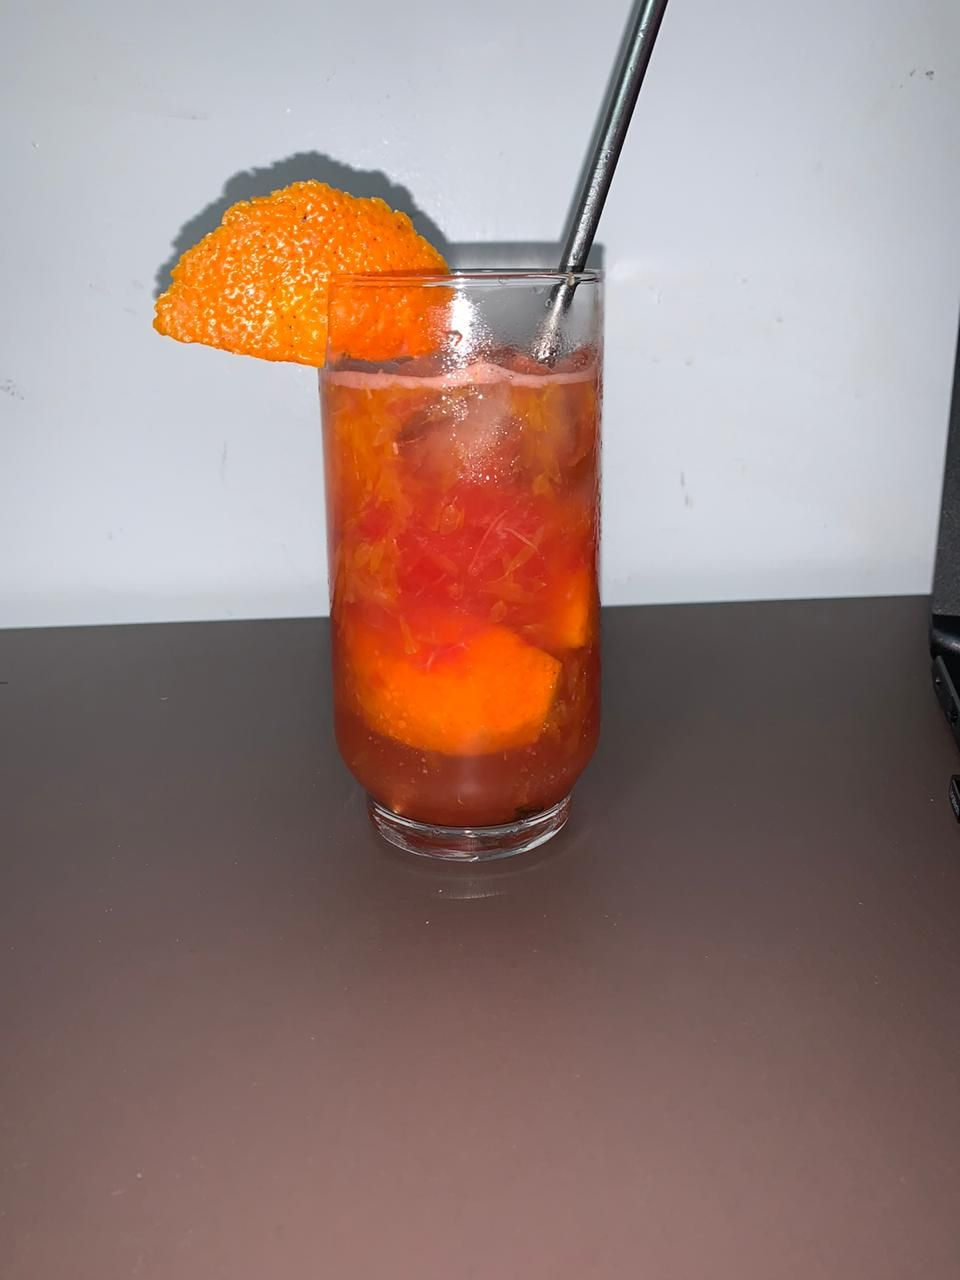 Caipiroska de tangerina com melancia